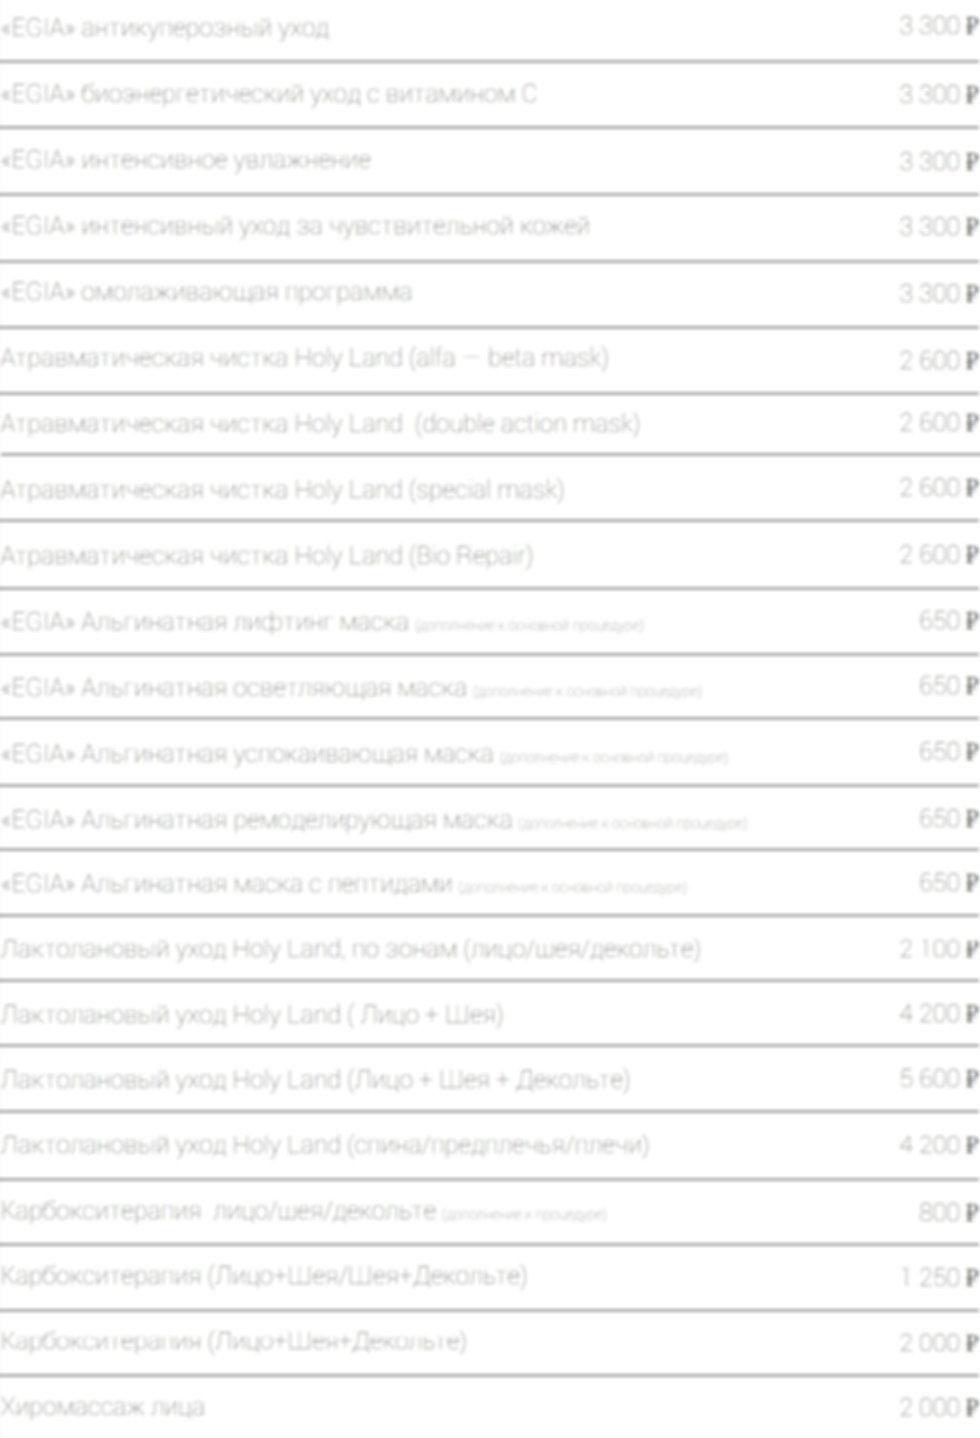 QIP Shot - Screen 004.jpg